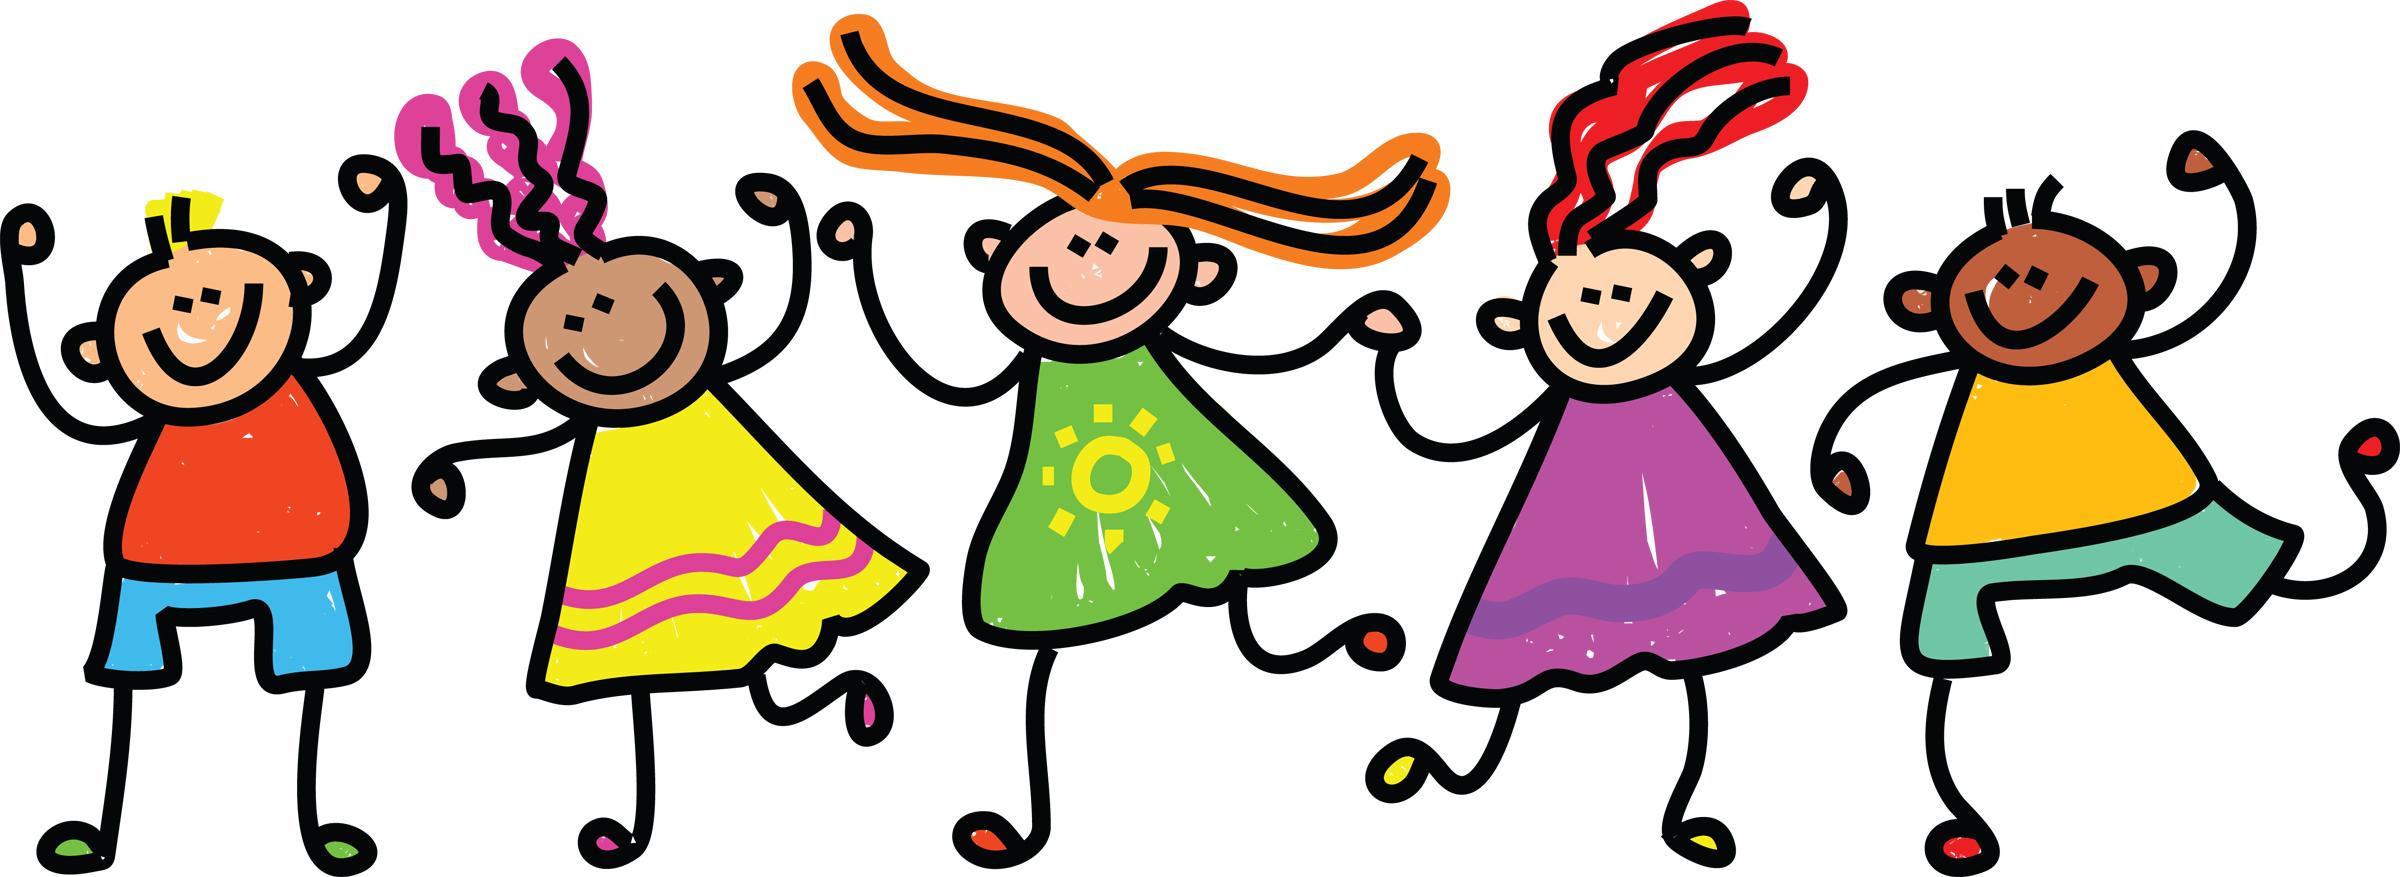 Happy Kids Dancing Clipart | Clipart Panda - Free Clipart Images